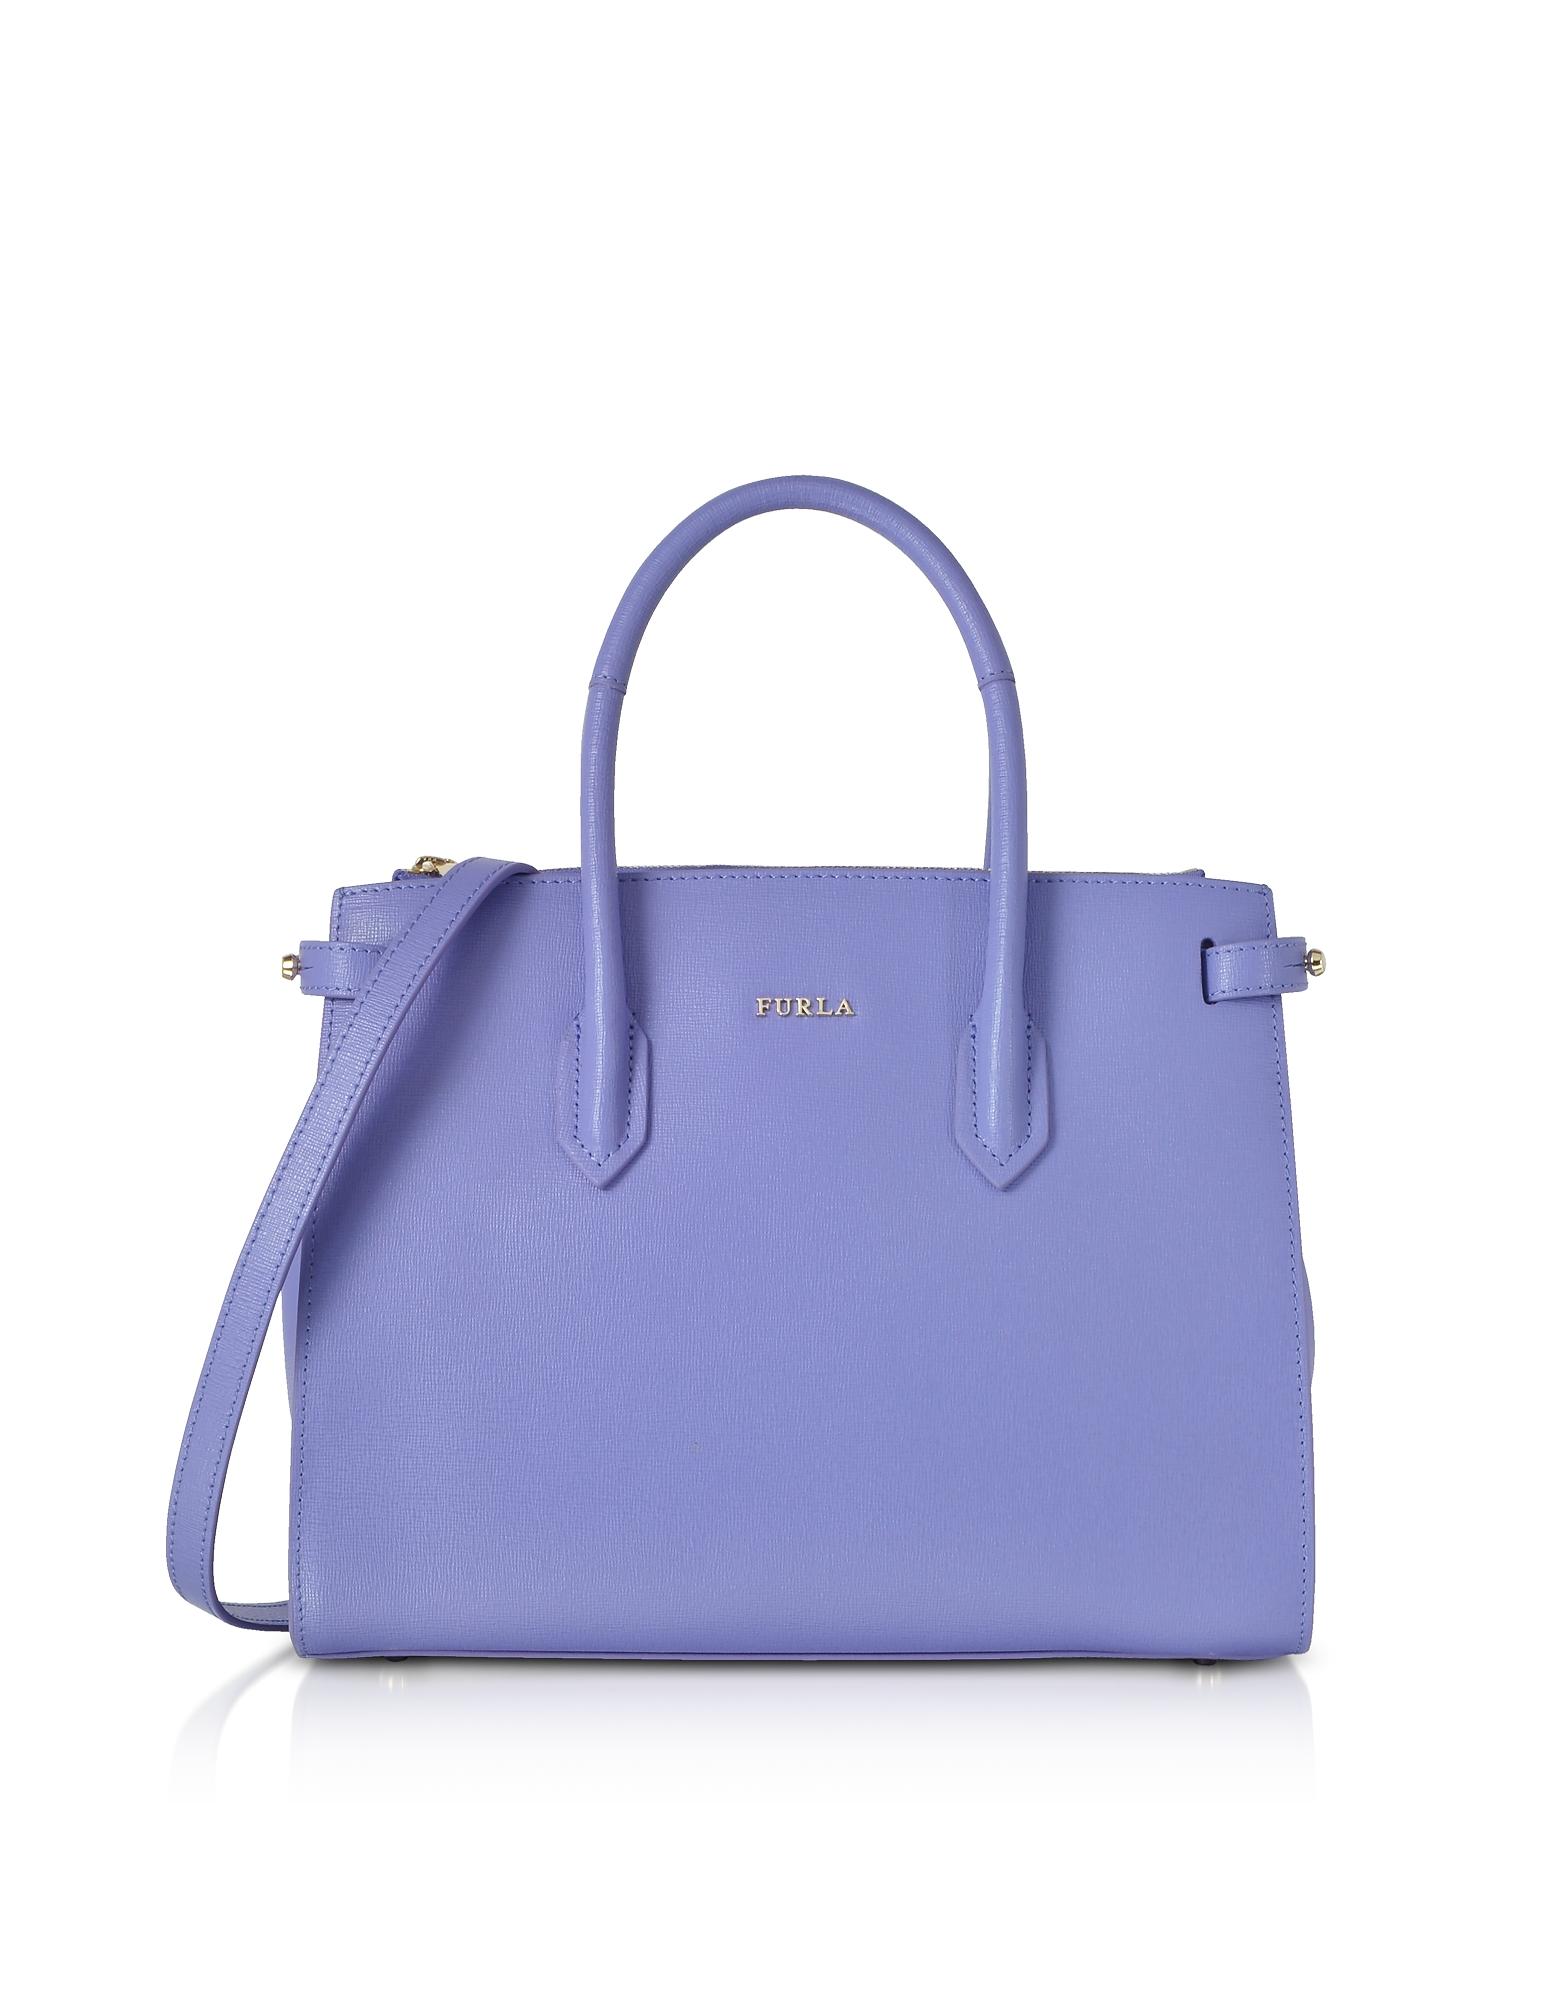 Image of Furla Designer Handbags, Pin Leather Small Tote Bag